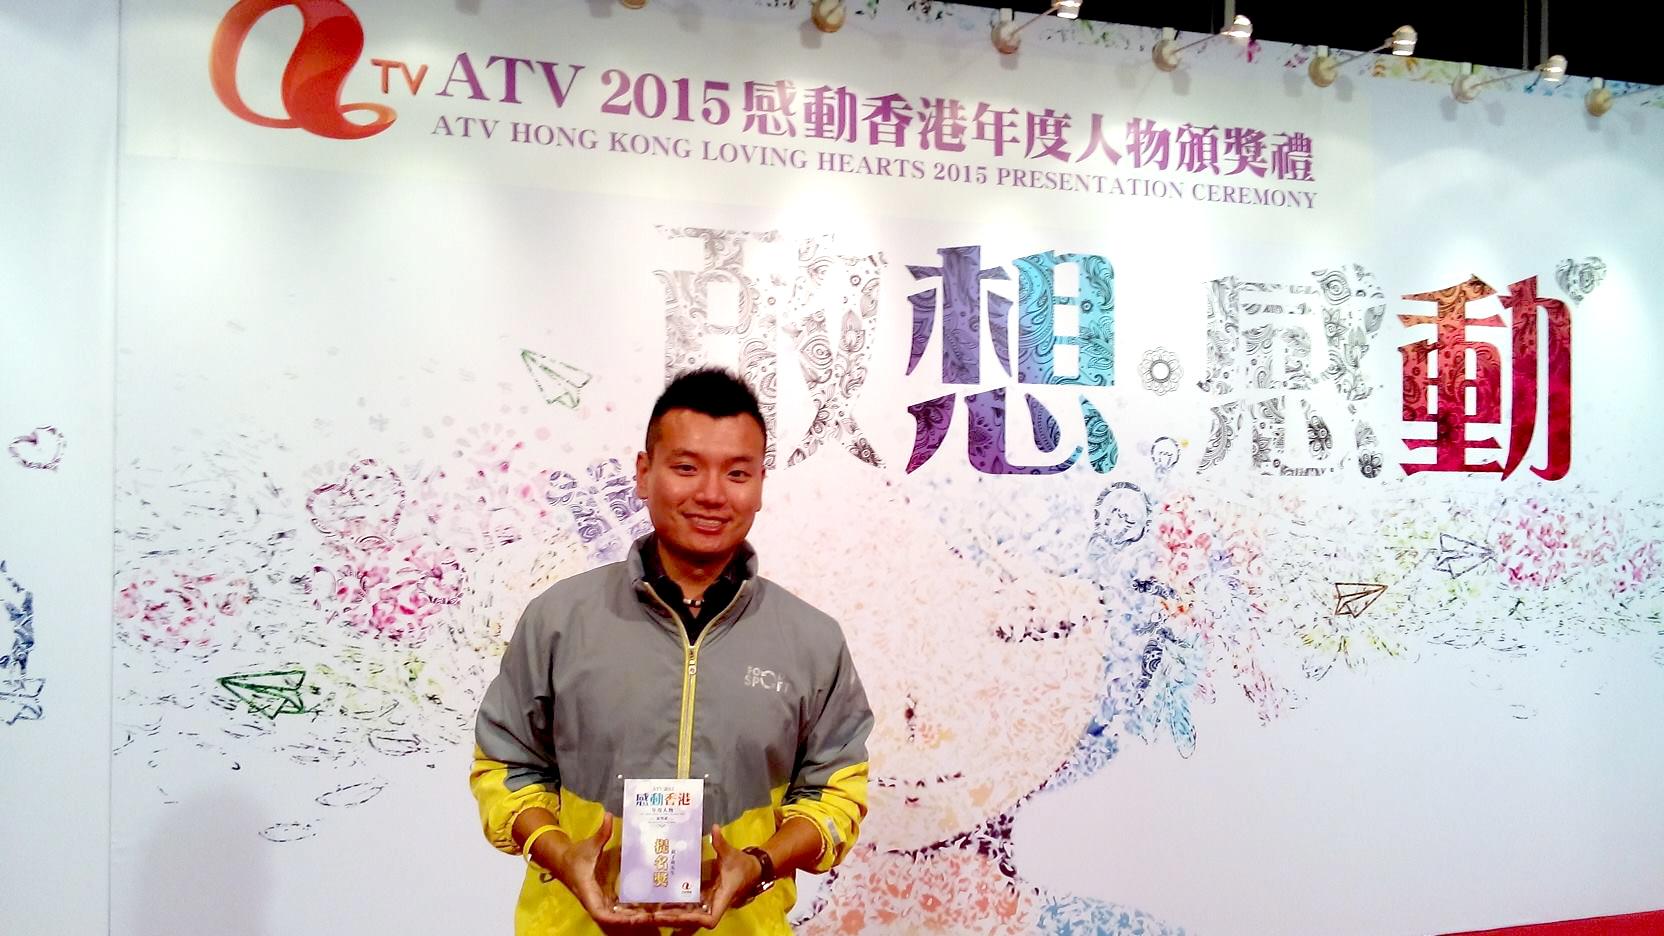 ATV 2015 感動香港年度人物